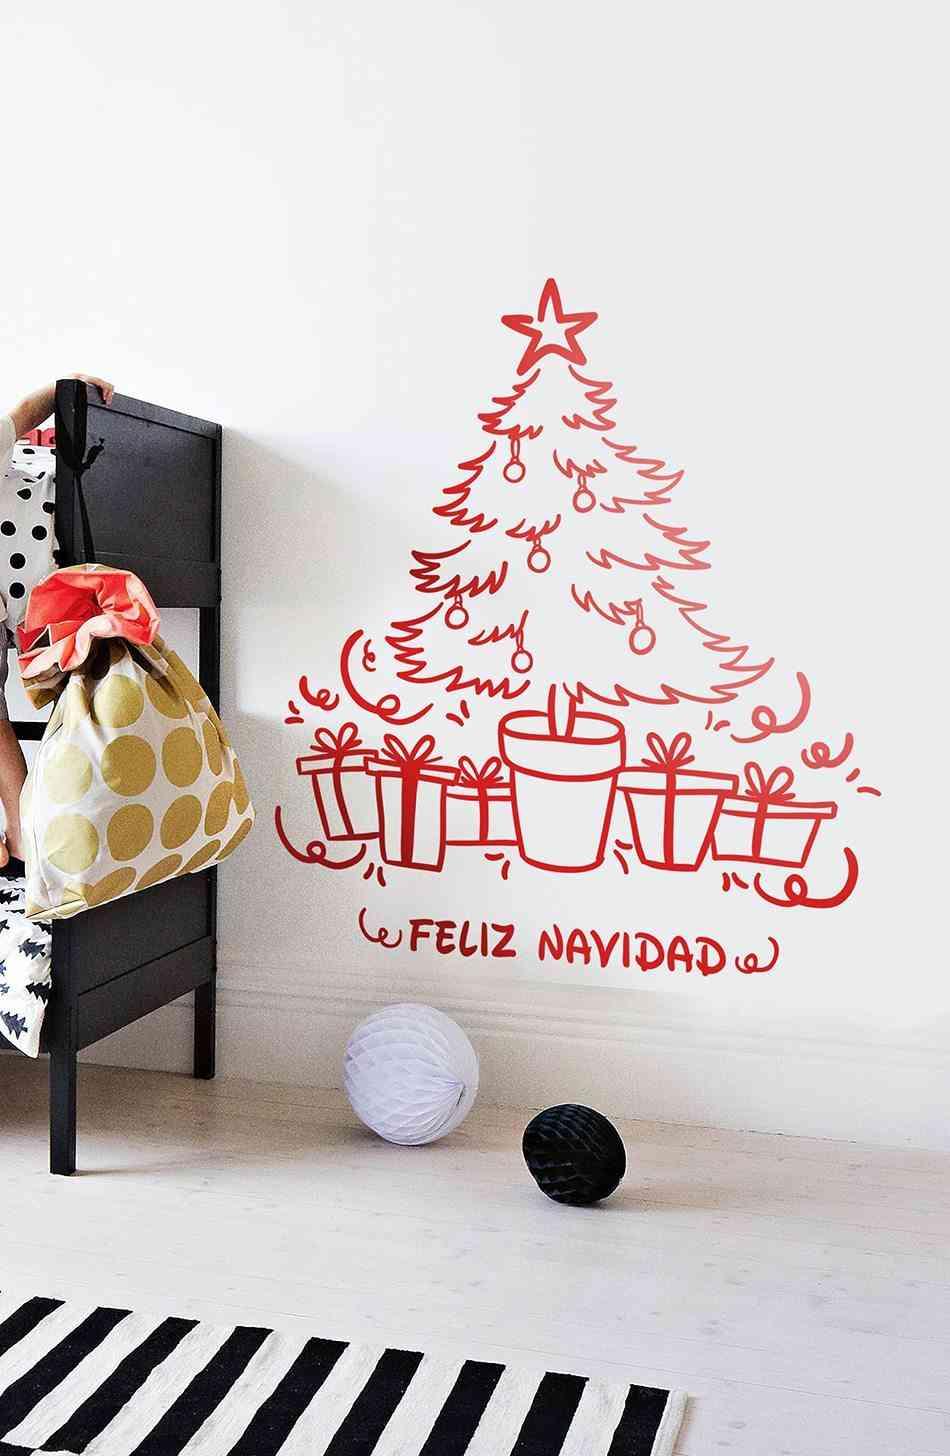 Vinilos decorativos navideños TENVINILO vinilo decoracion arbol navidad